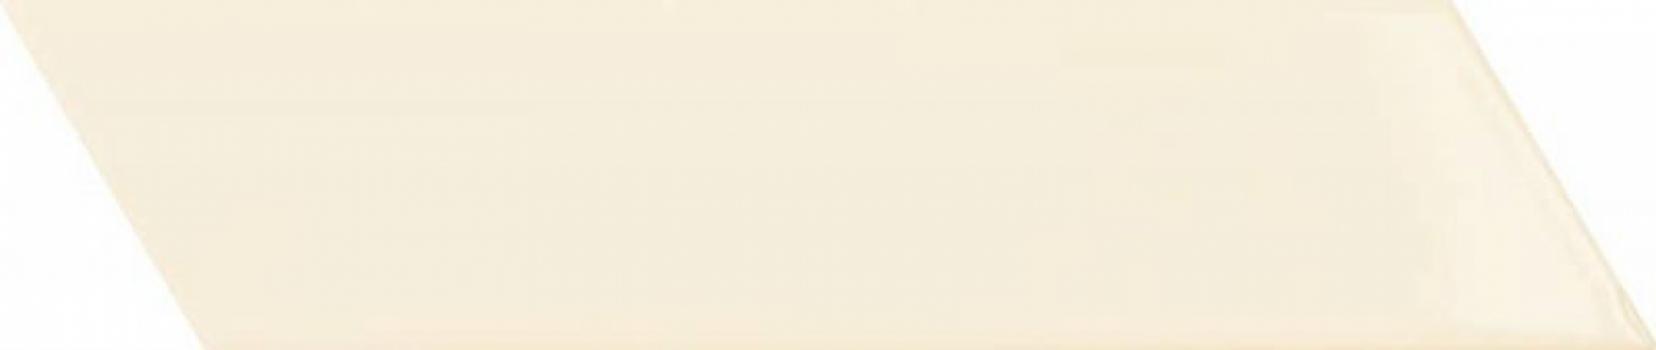 плитка настенная chevron ivory right 6,4x26 см CEVICA Ivory Right